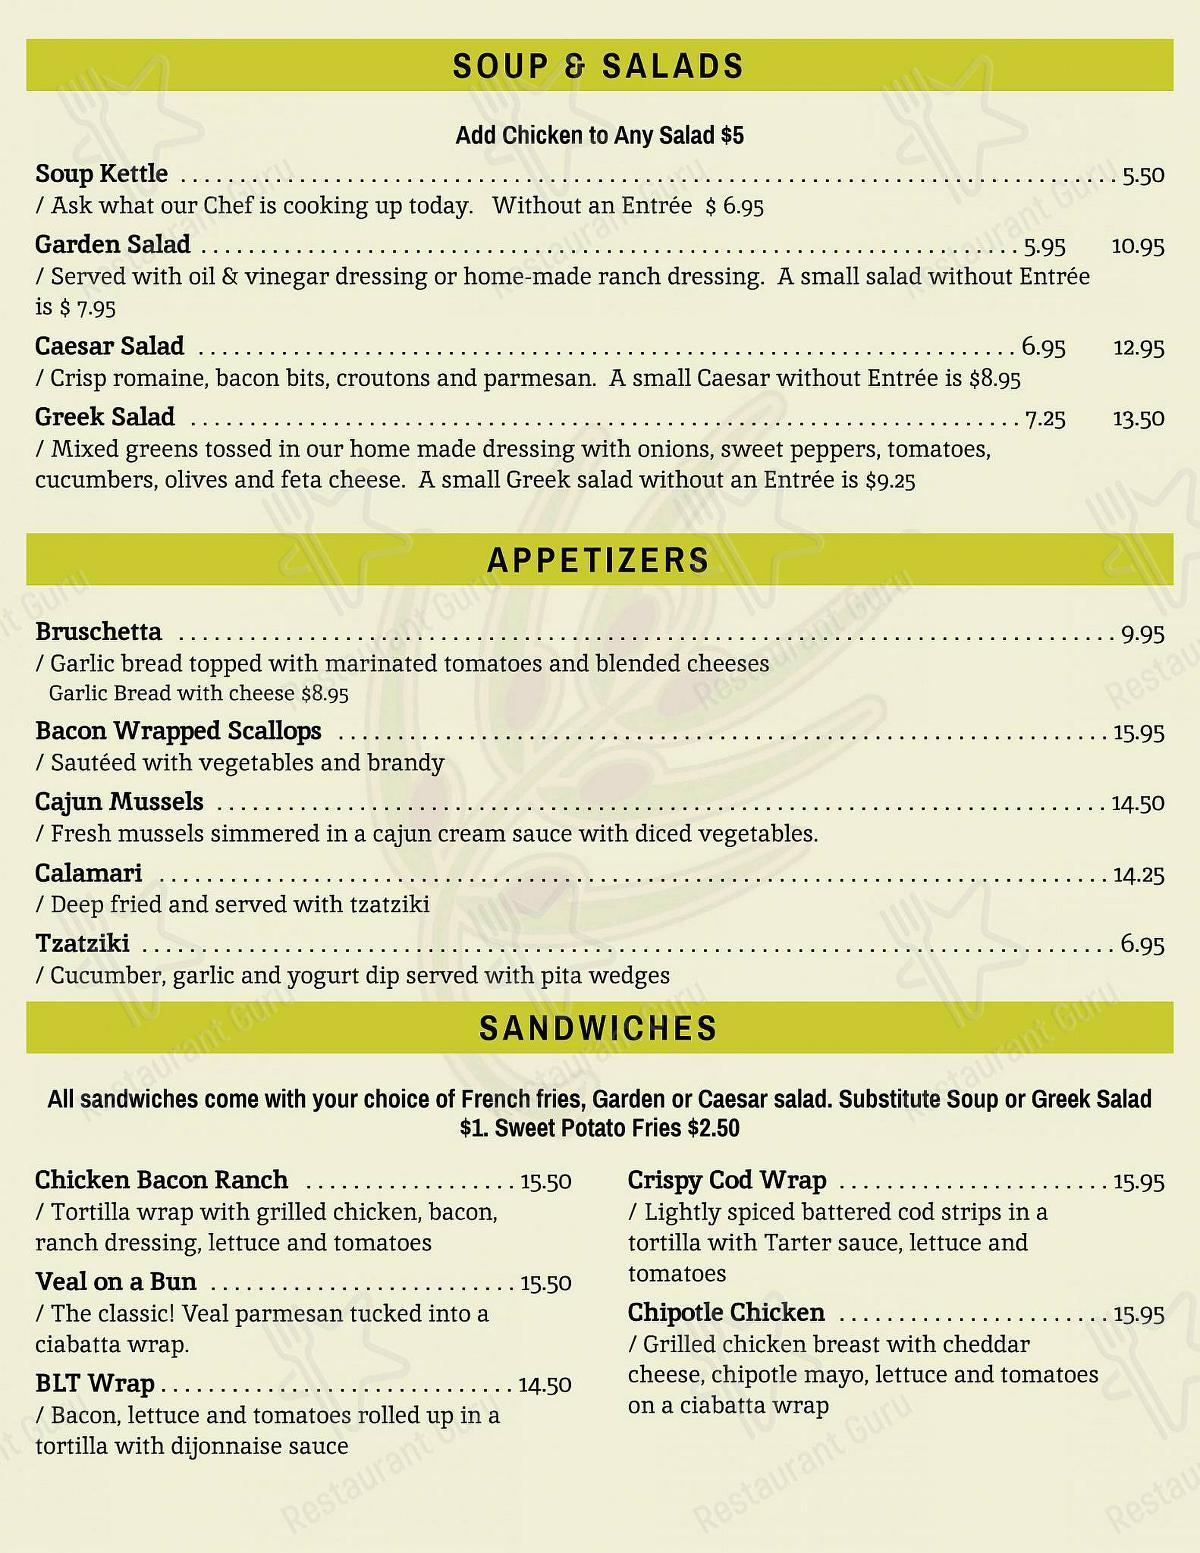 Menu for the ROMERO'S RESTAURANT restaurant